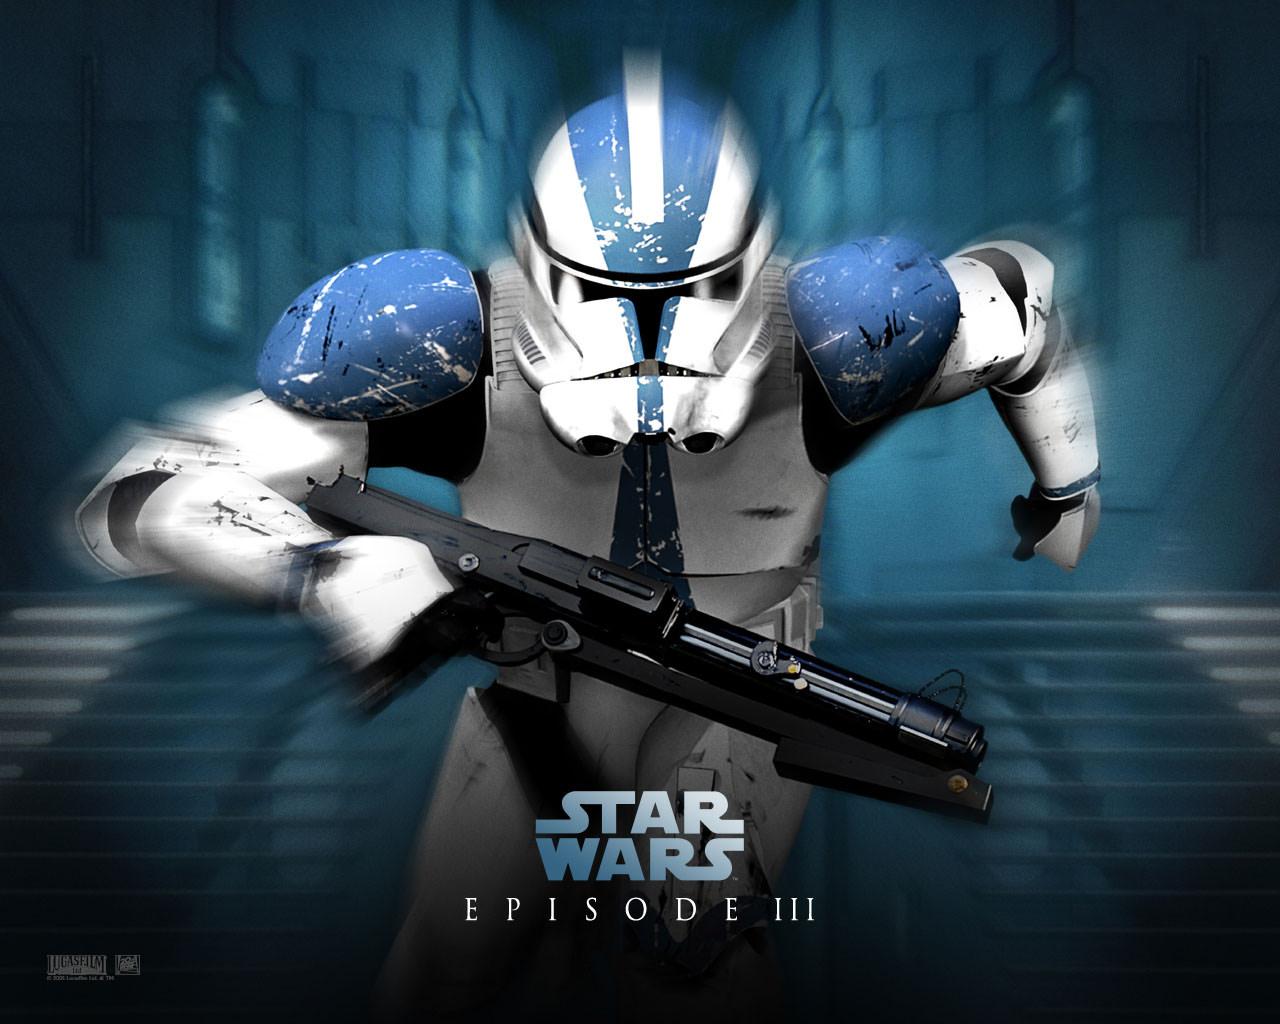 Vidéo : Star Wars avec le Microsoft Kinect